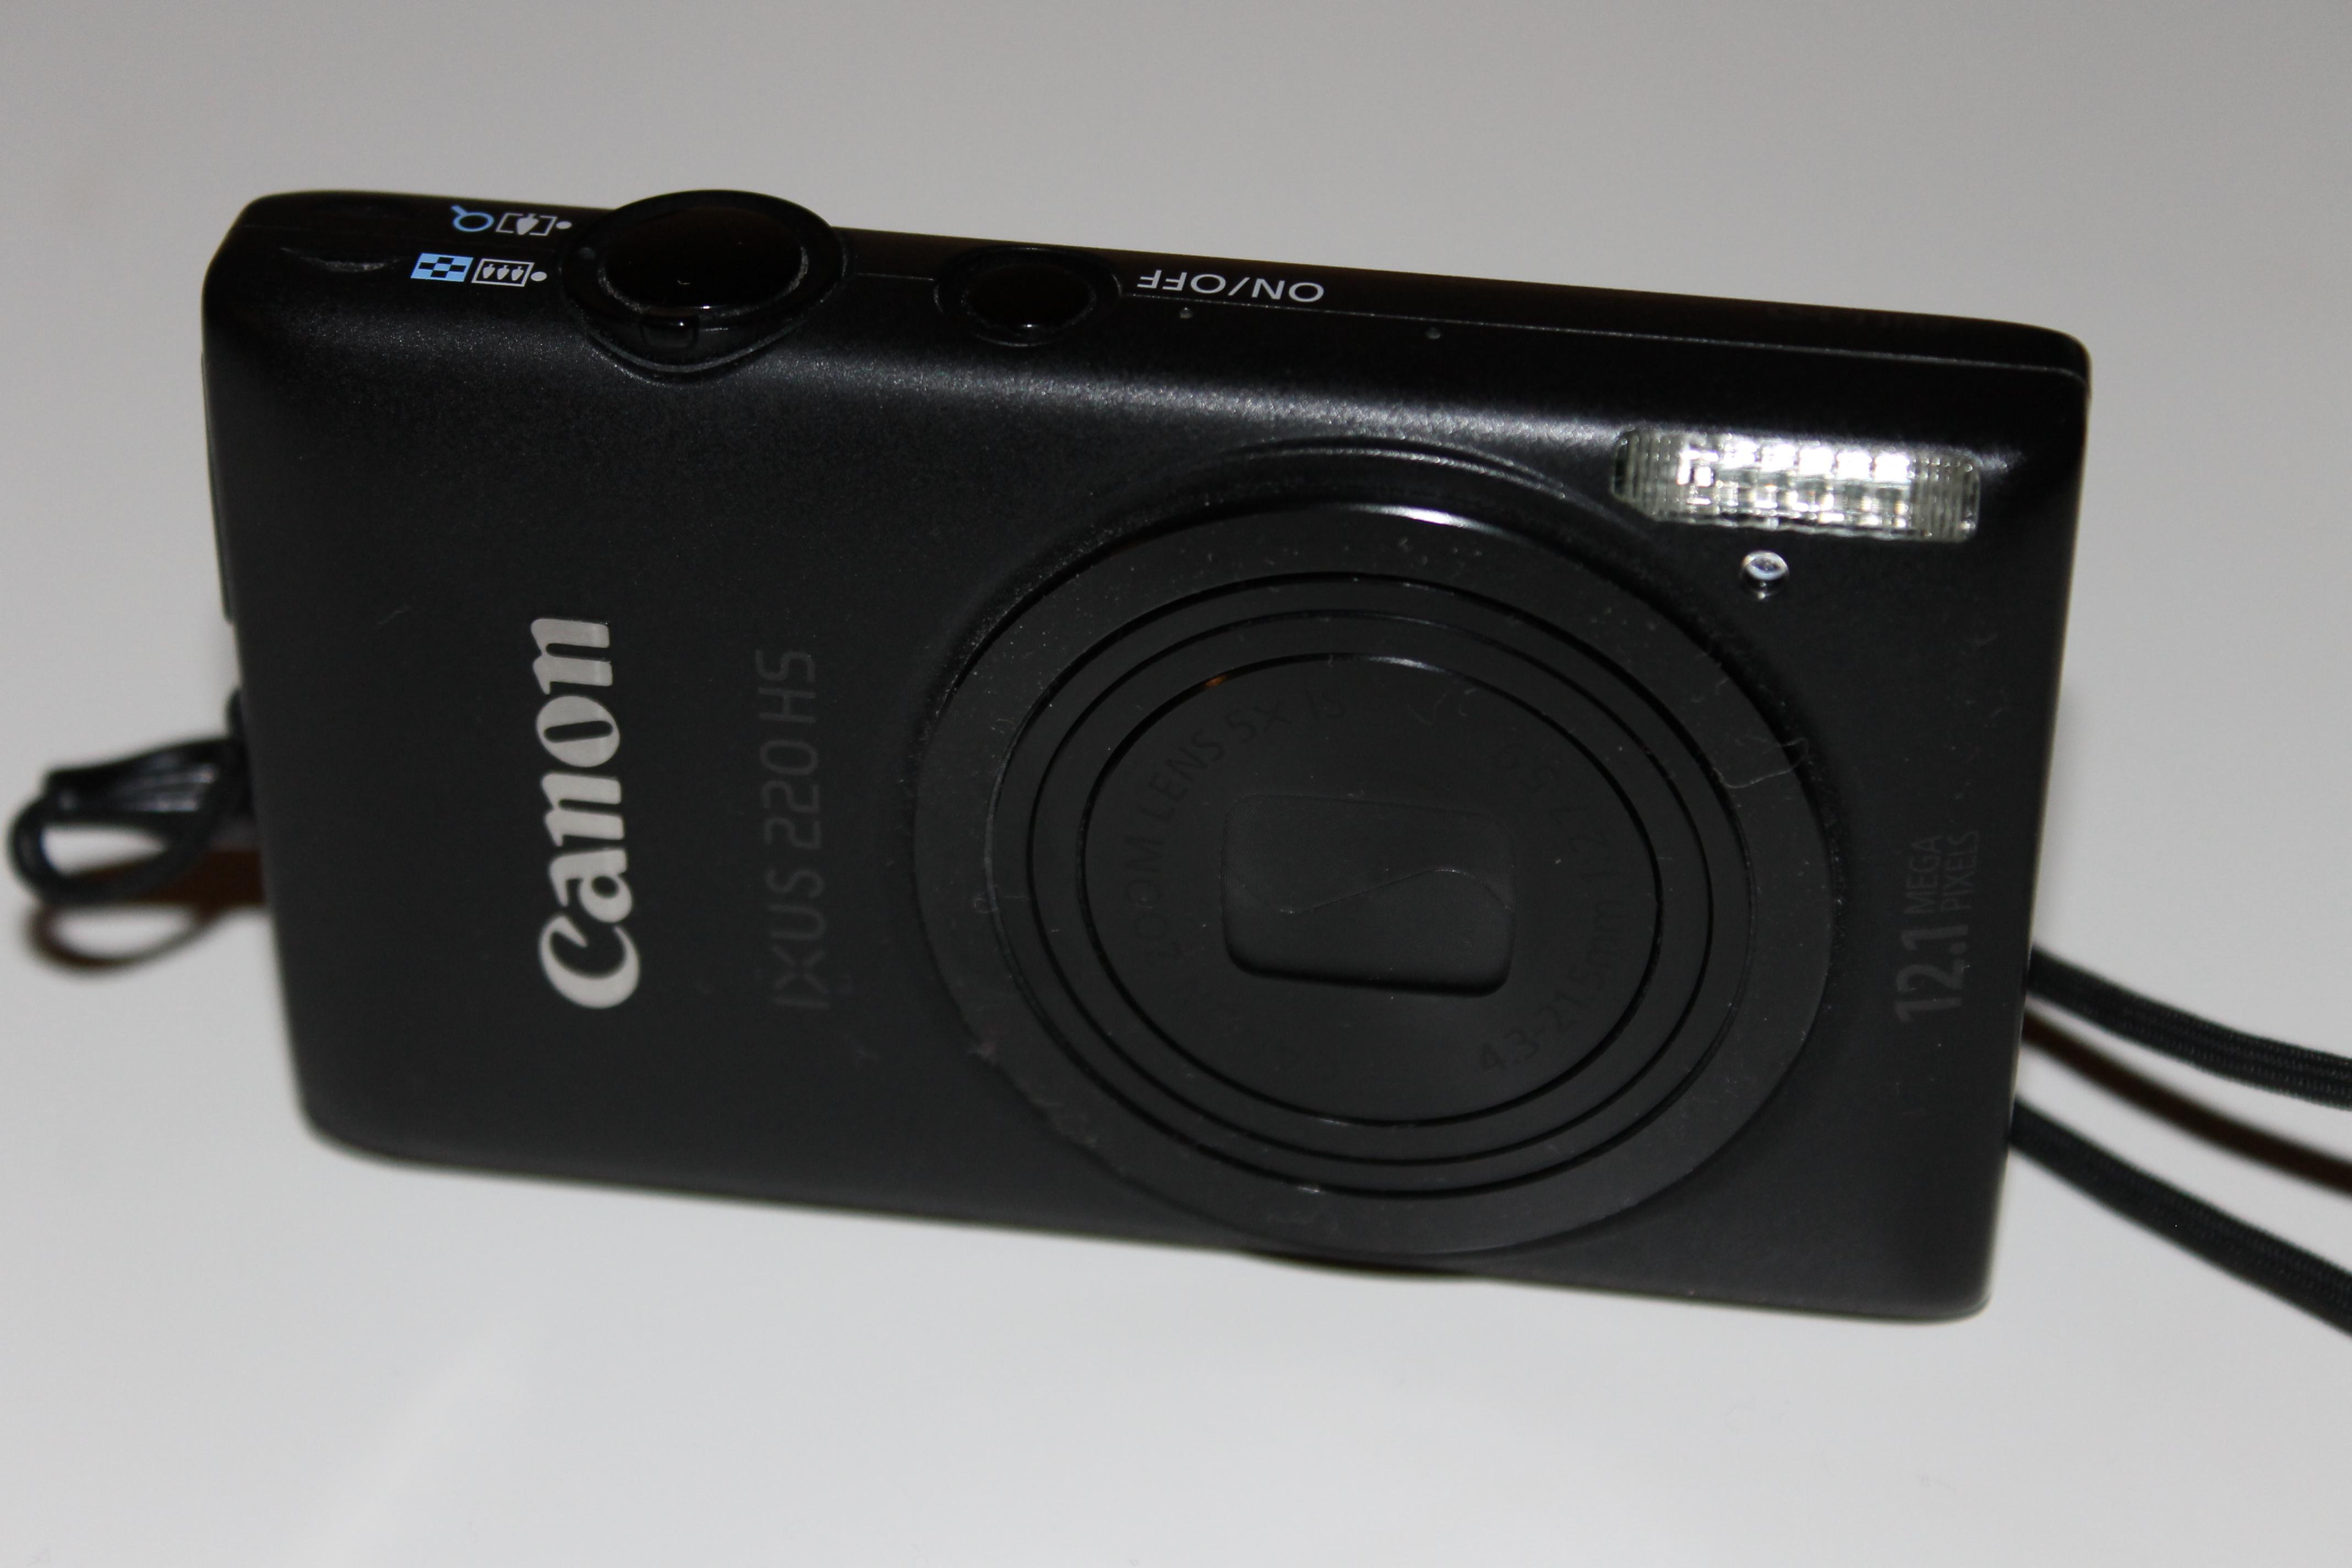 File:Canon IXUS 220 HS.jpg